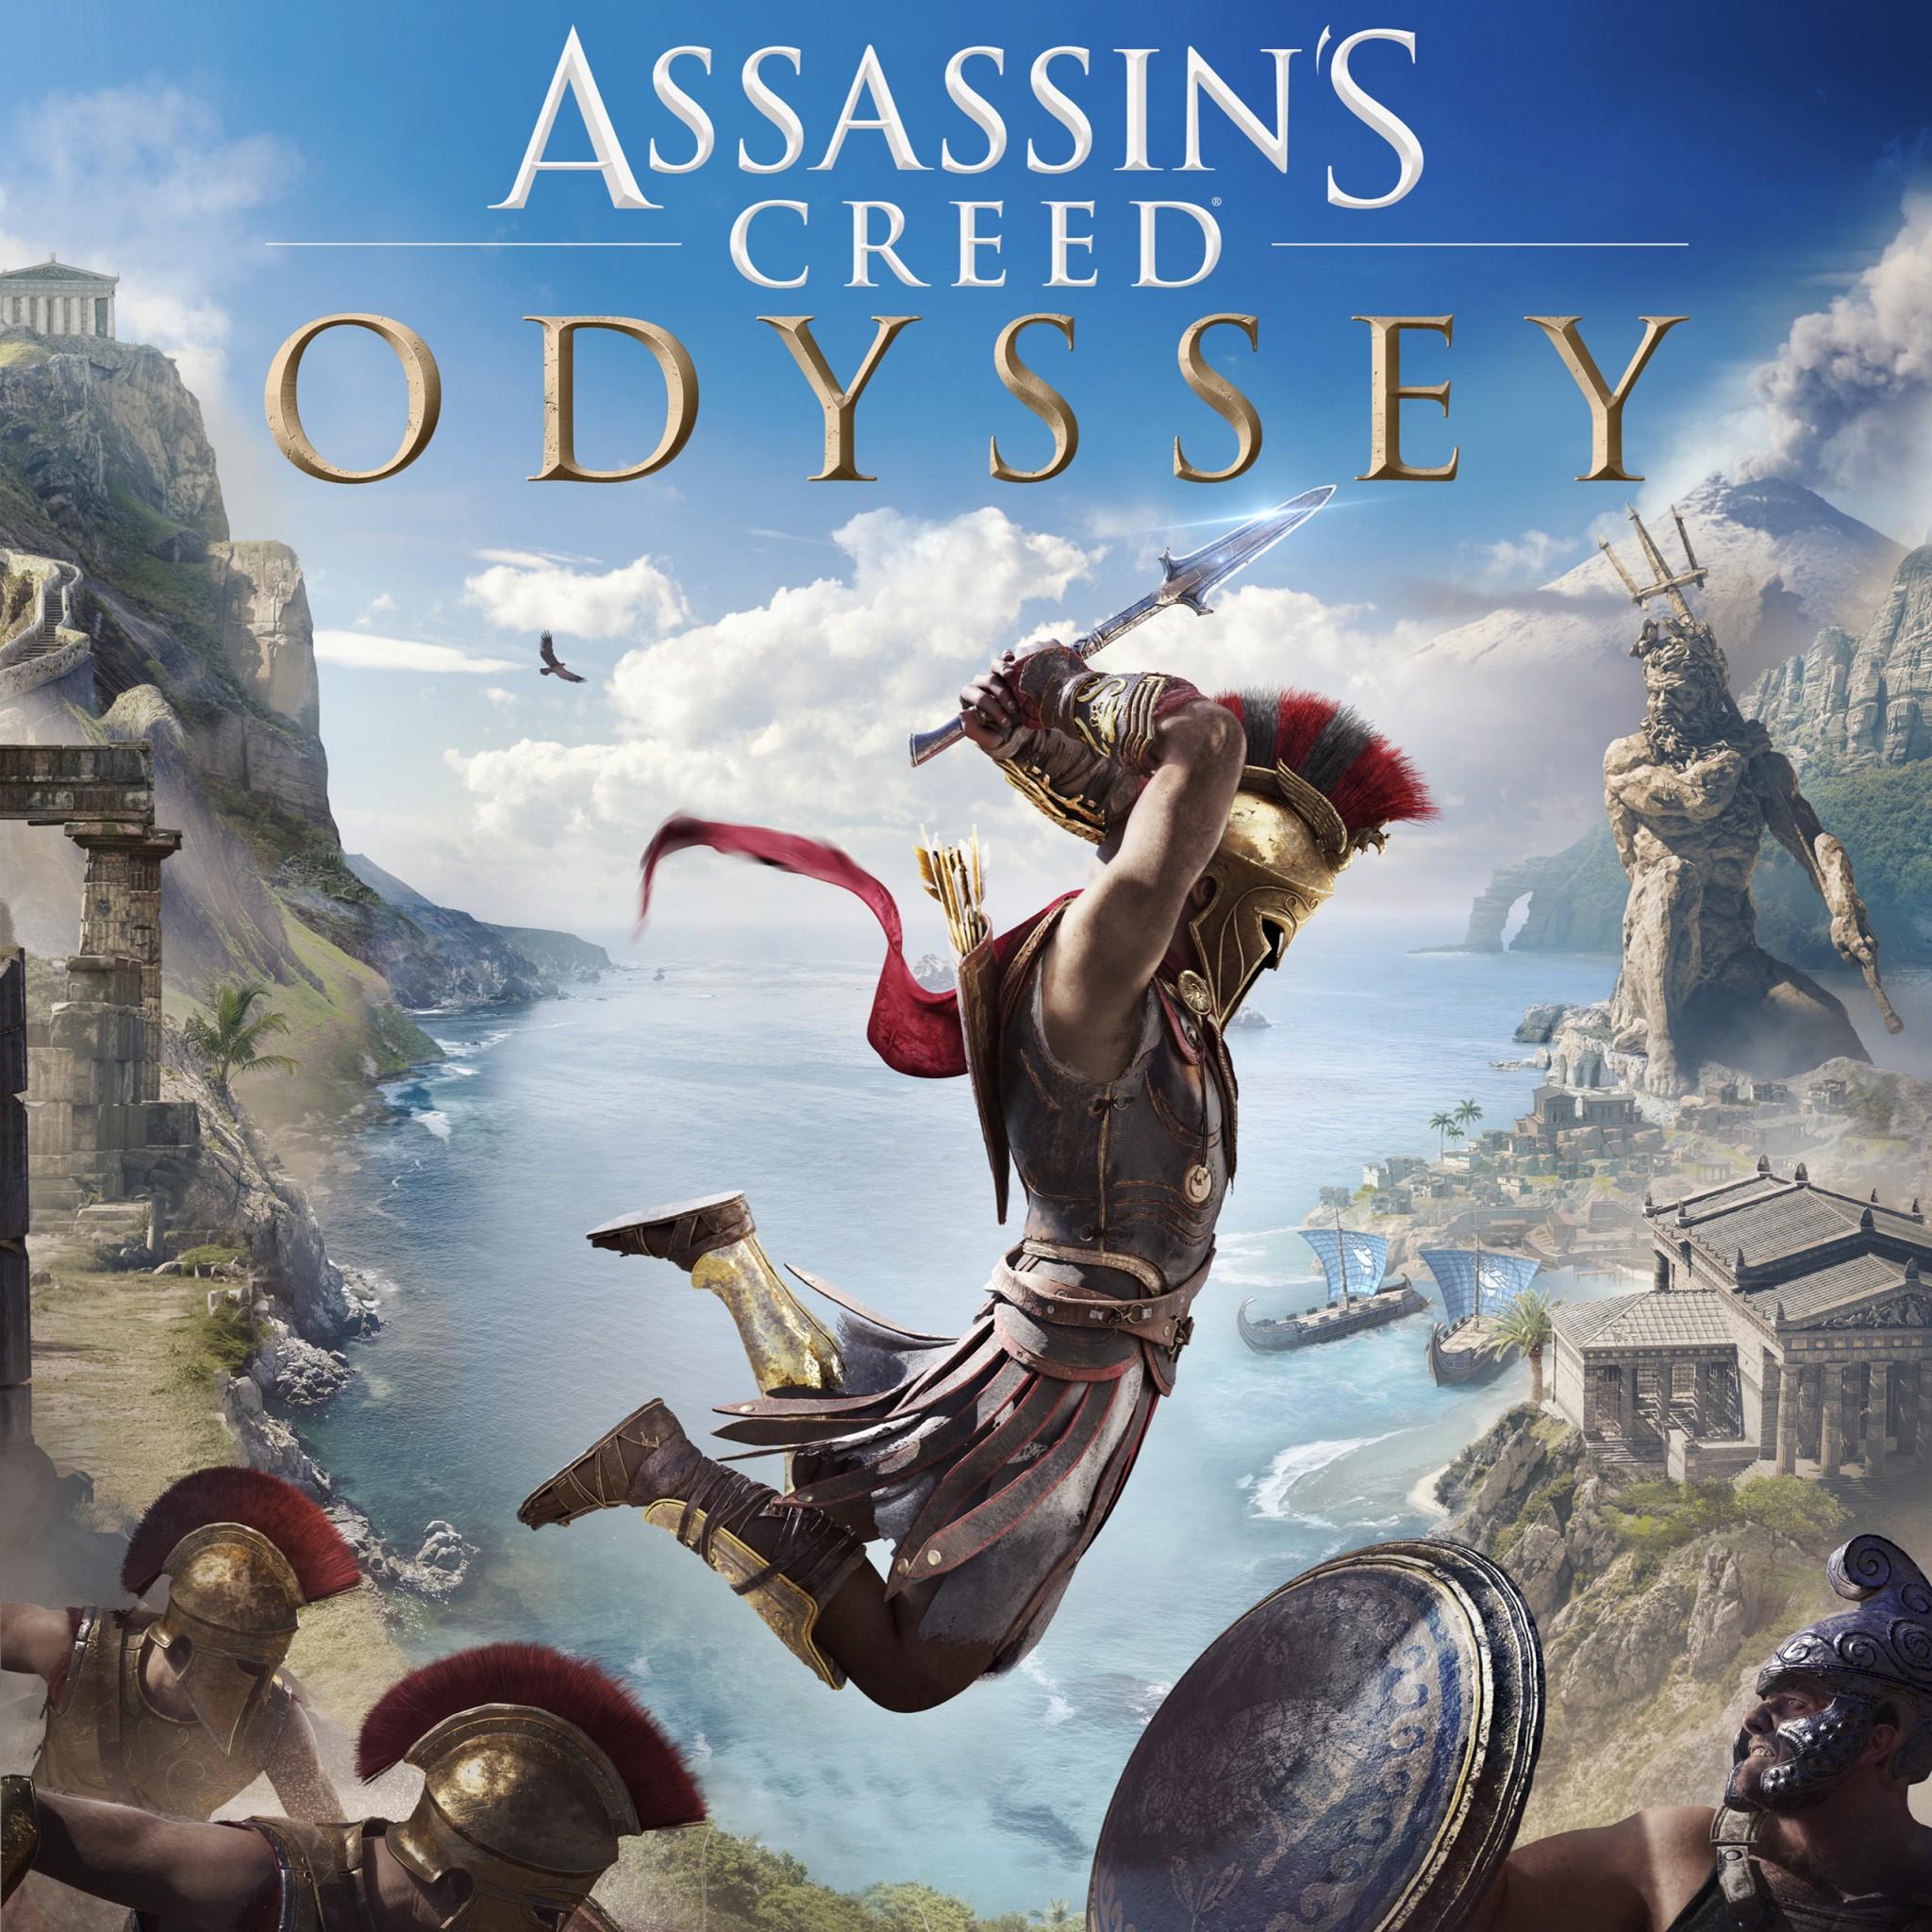 Ipad Hd Wallpaper  Assassin S Creed Odyssey E3 2018 Wallpapers Hd